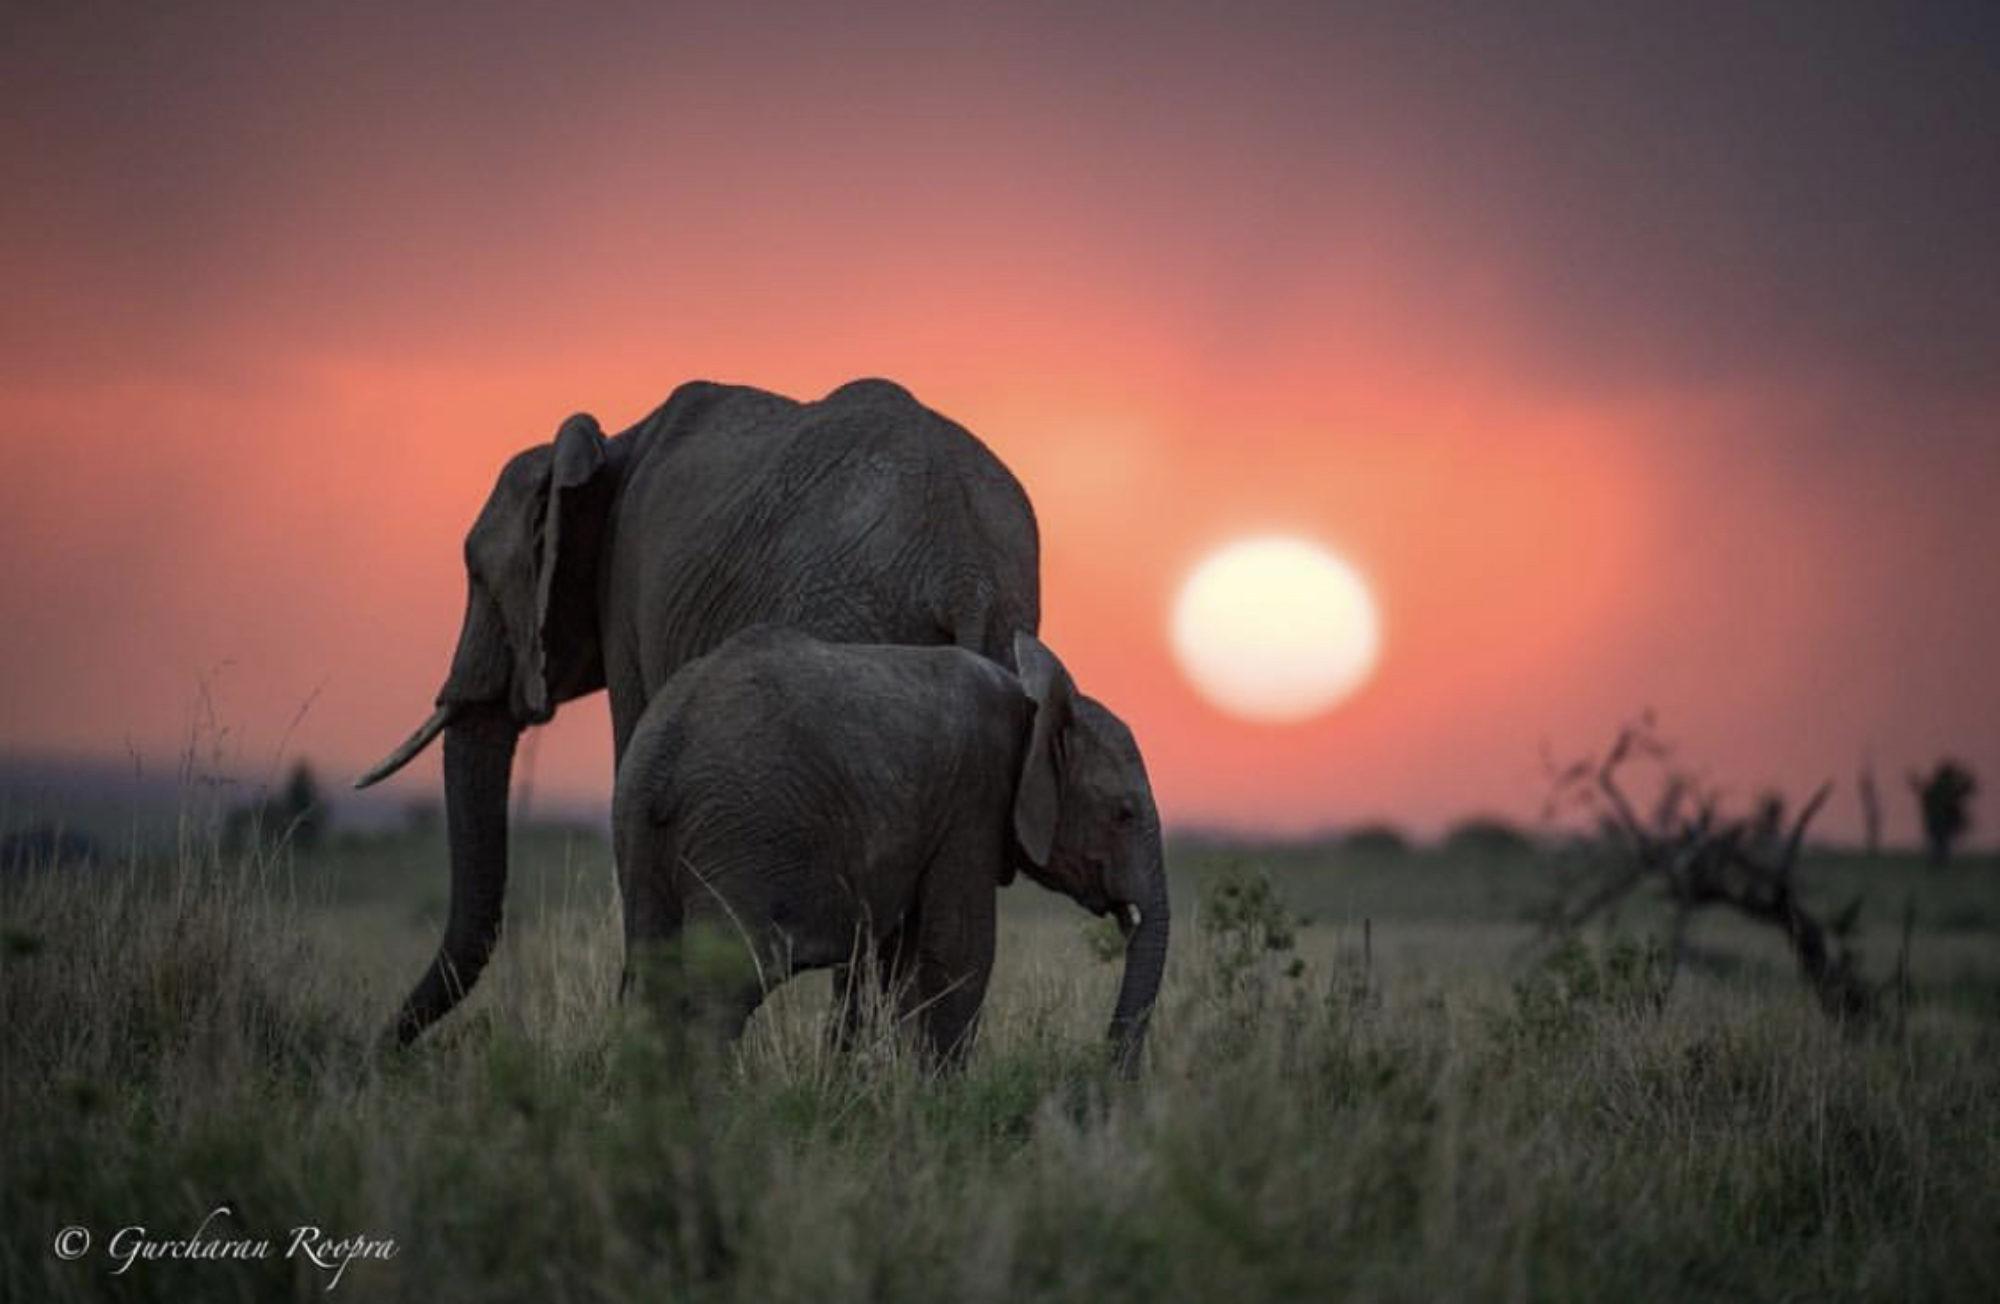 PRO ELEPHANT NETWORK